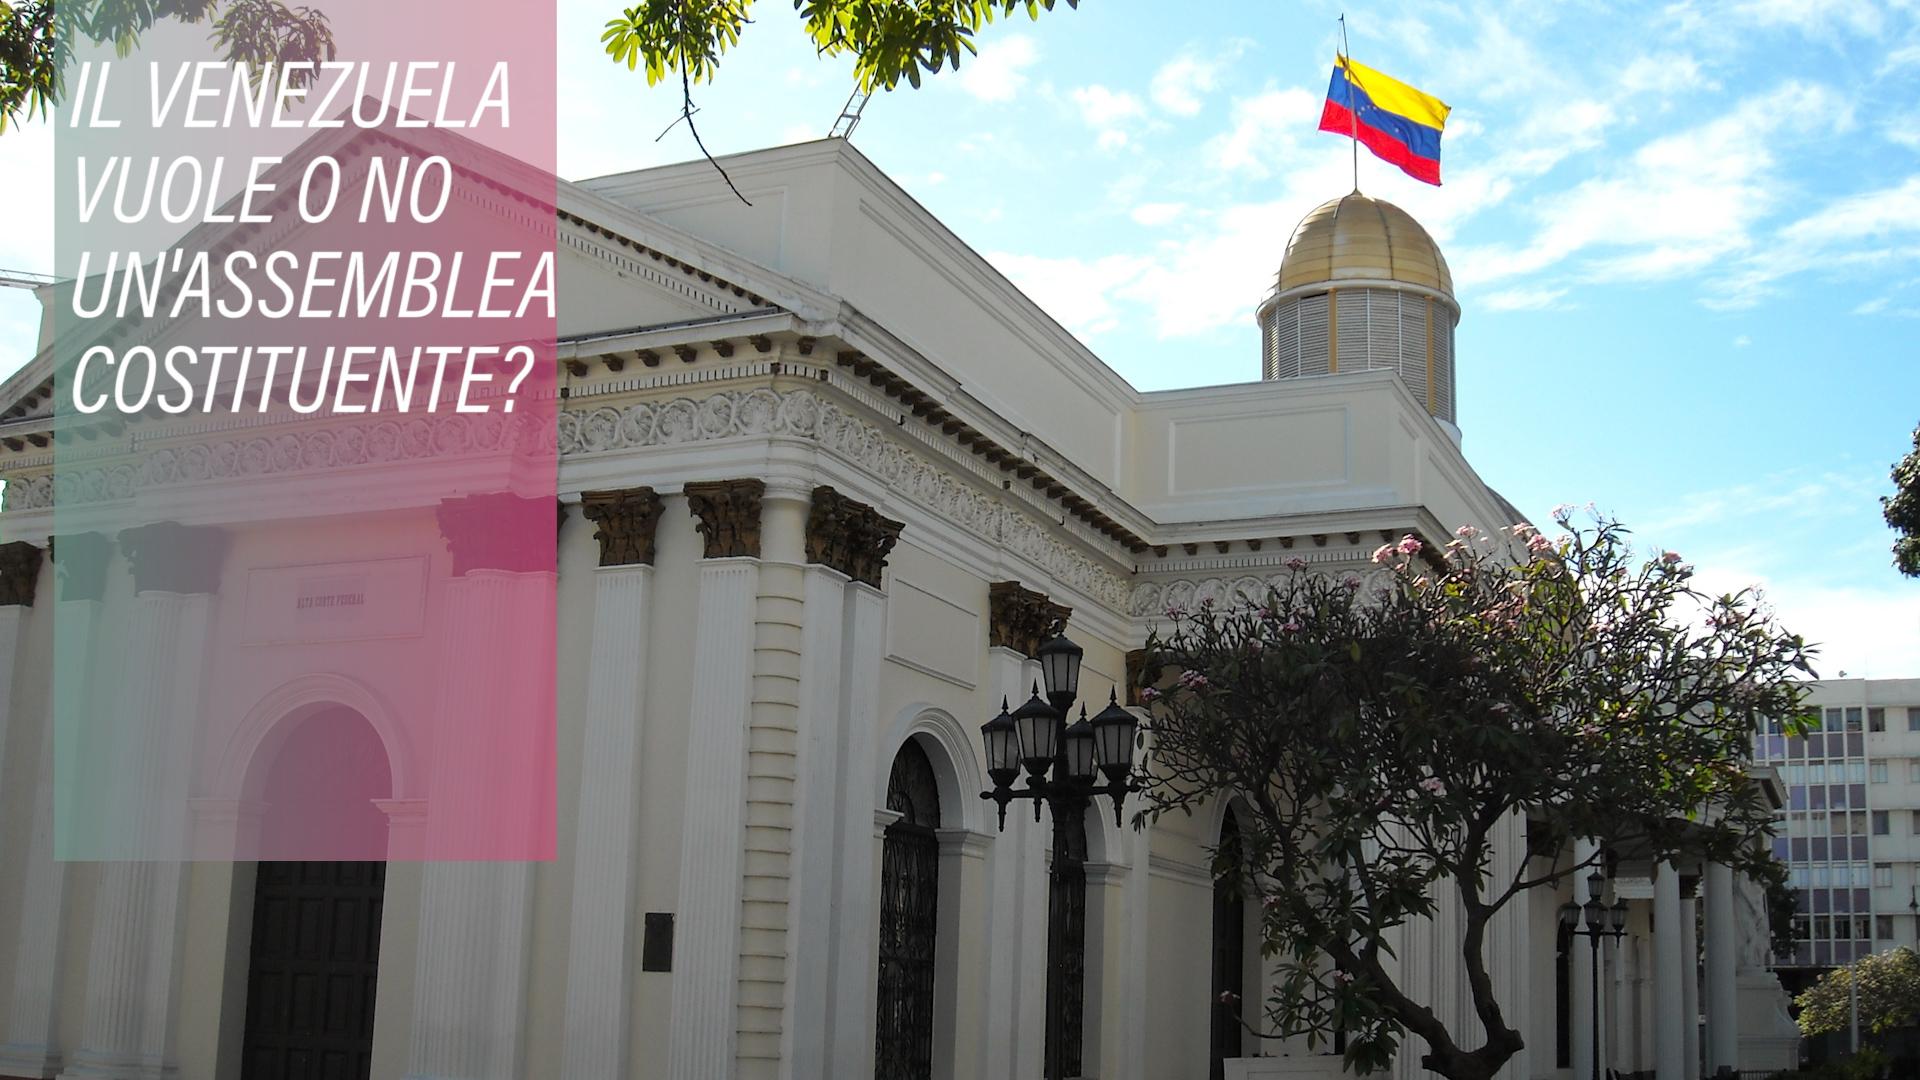 Cosa sapere sull'assemblea costituente venezuelana